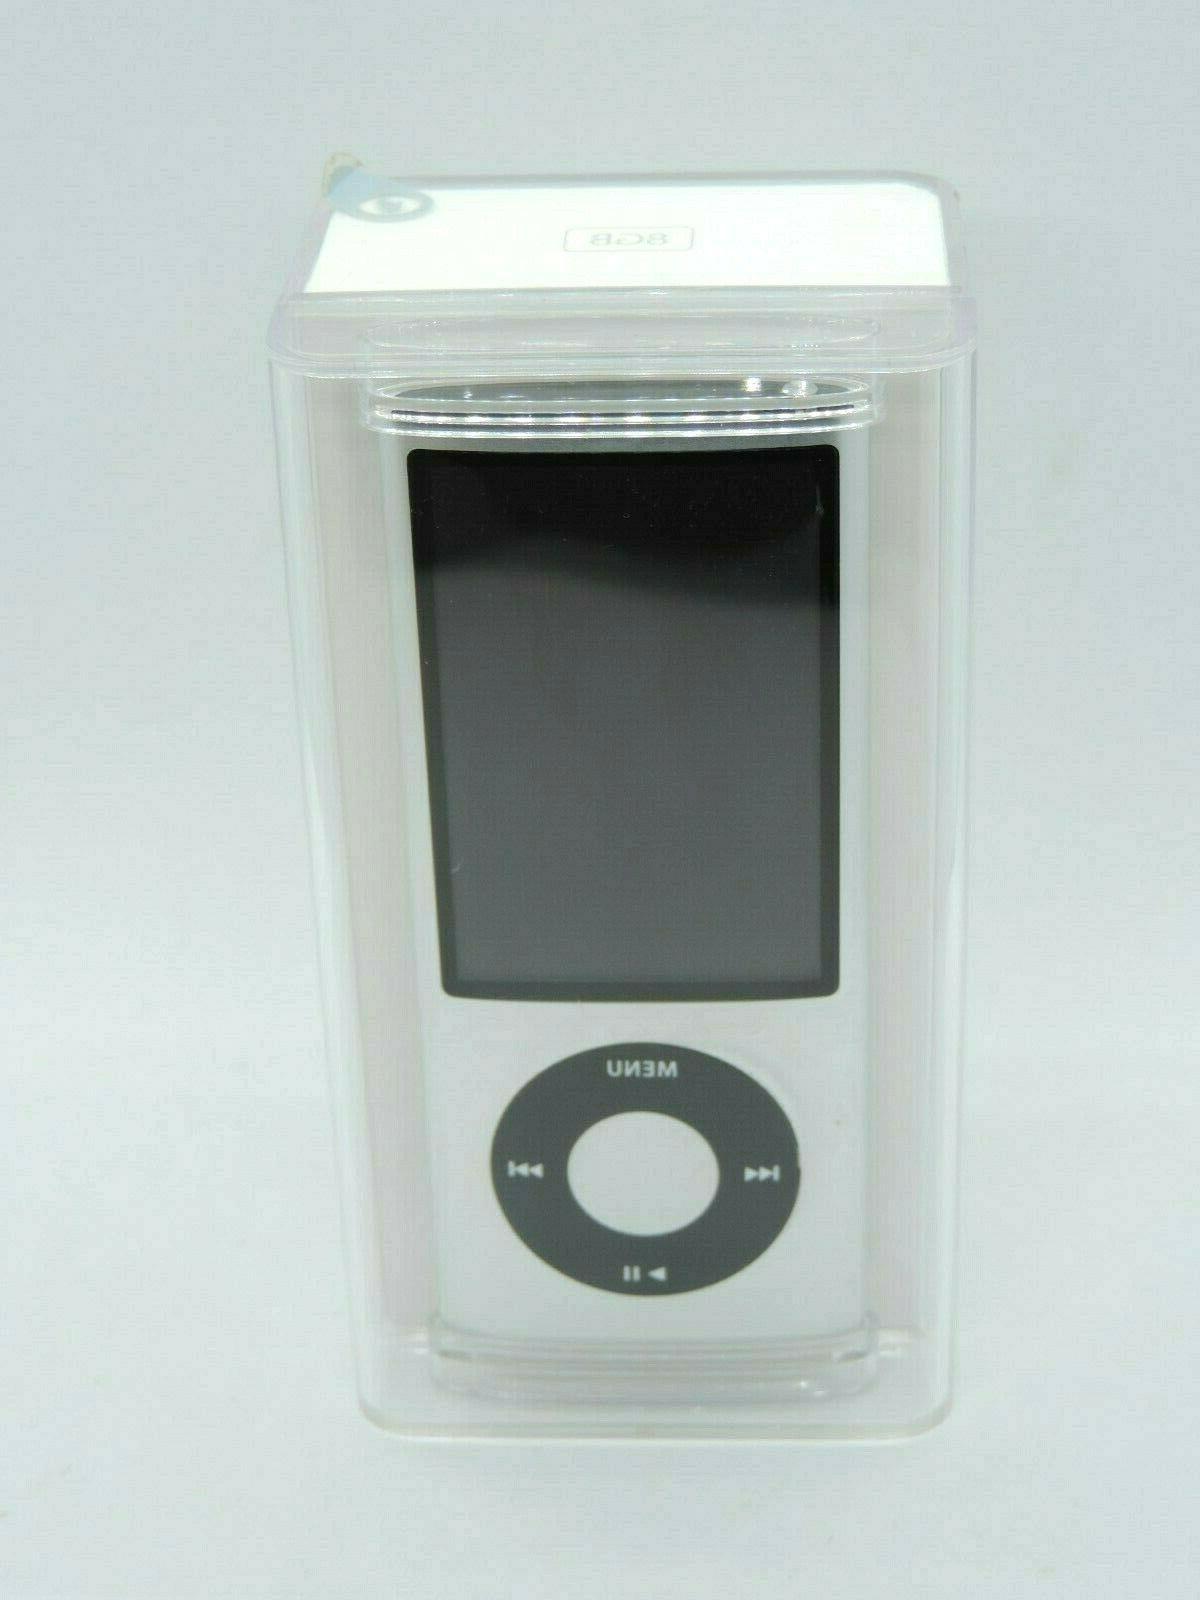 Apple iPod nano 5th Generation Silver MC027LL/A Player Collectible